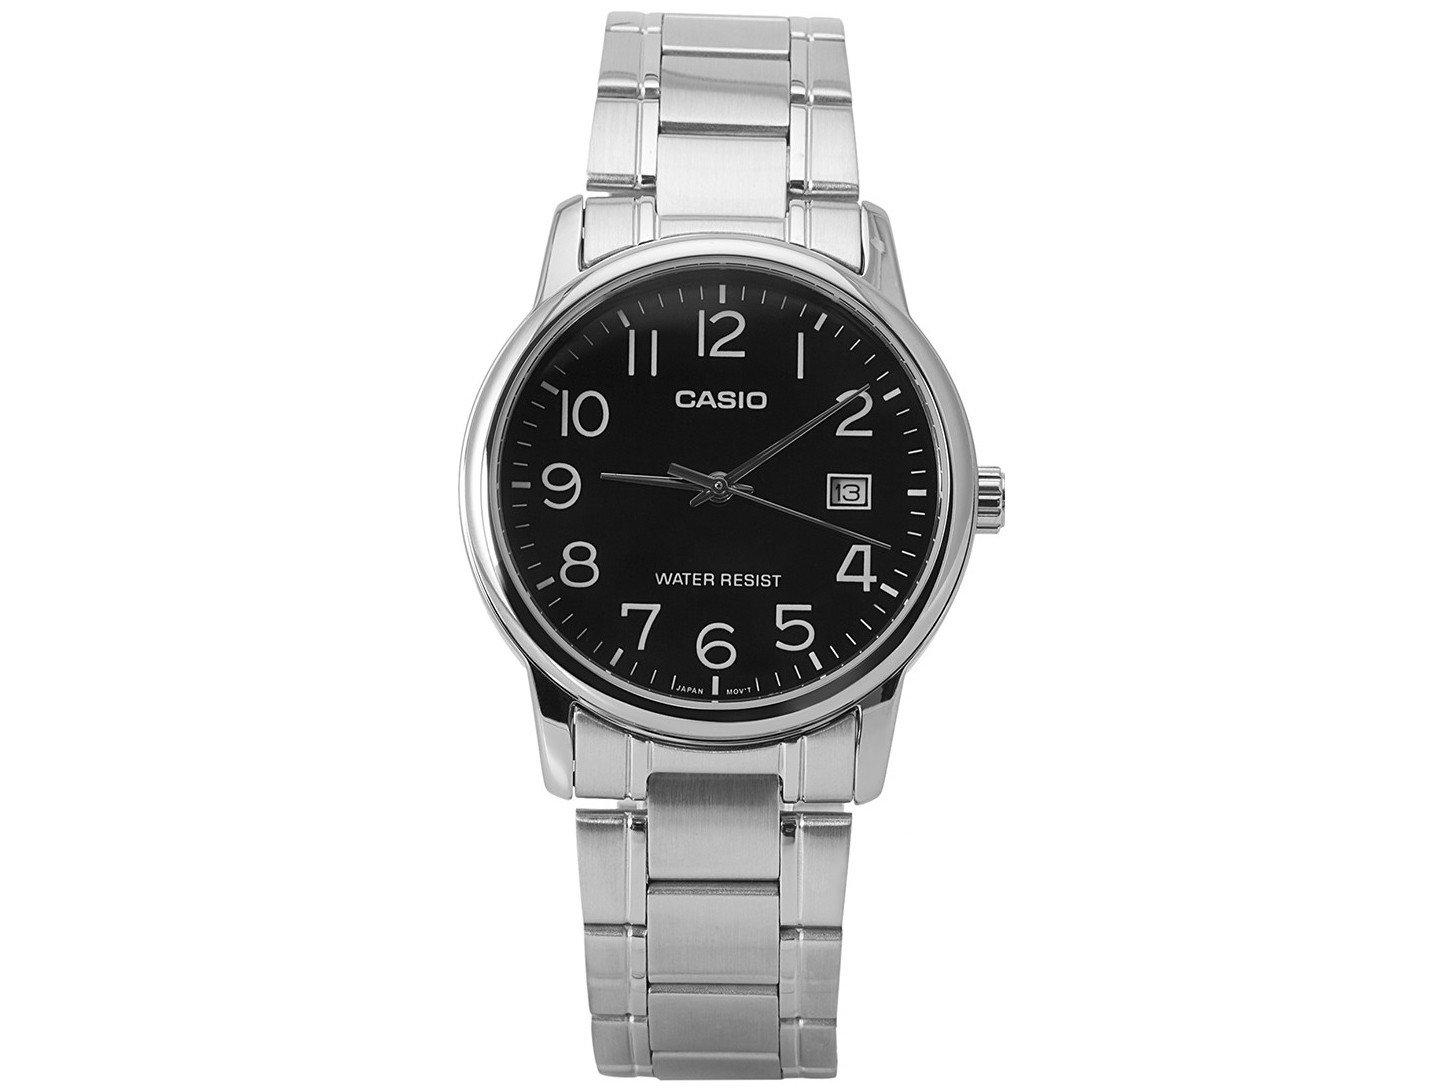 db265a6ea80 Relógio Masculino Casio Analógico MTP-V002D-1BUDF - Relógio ...